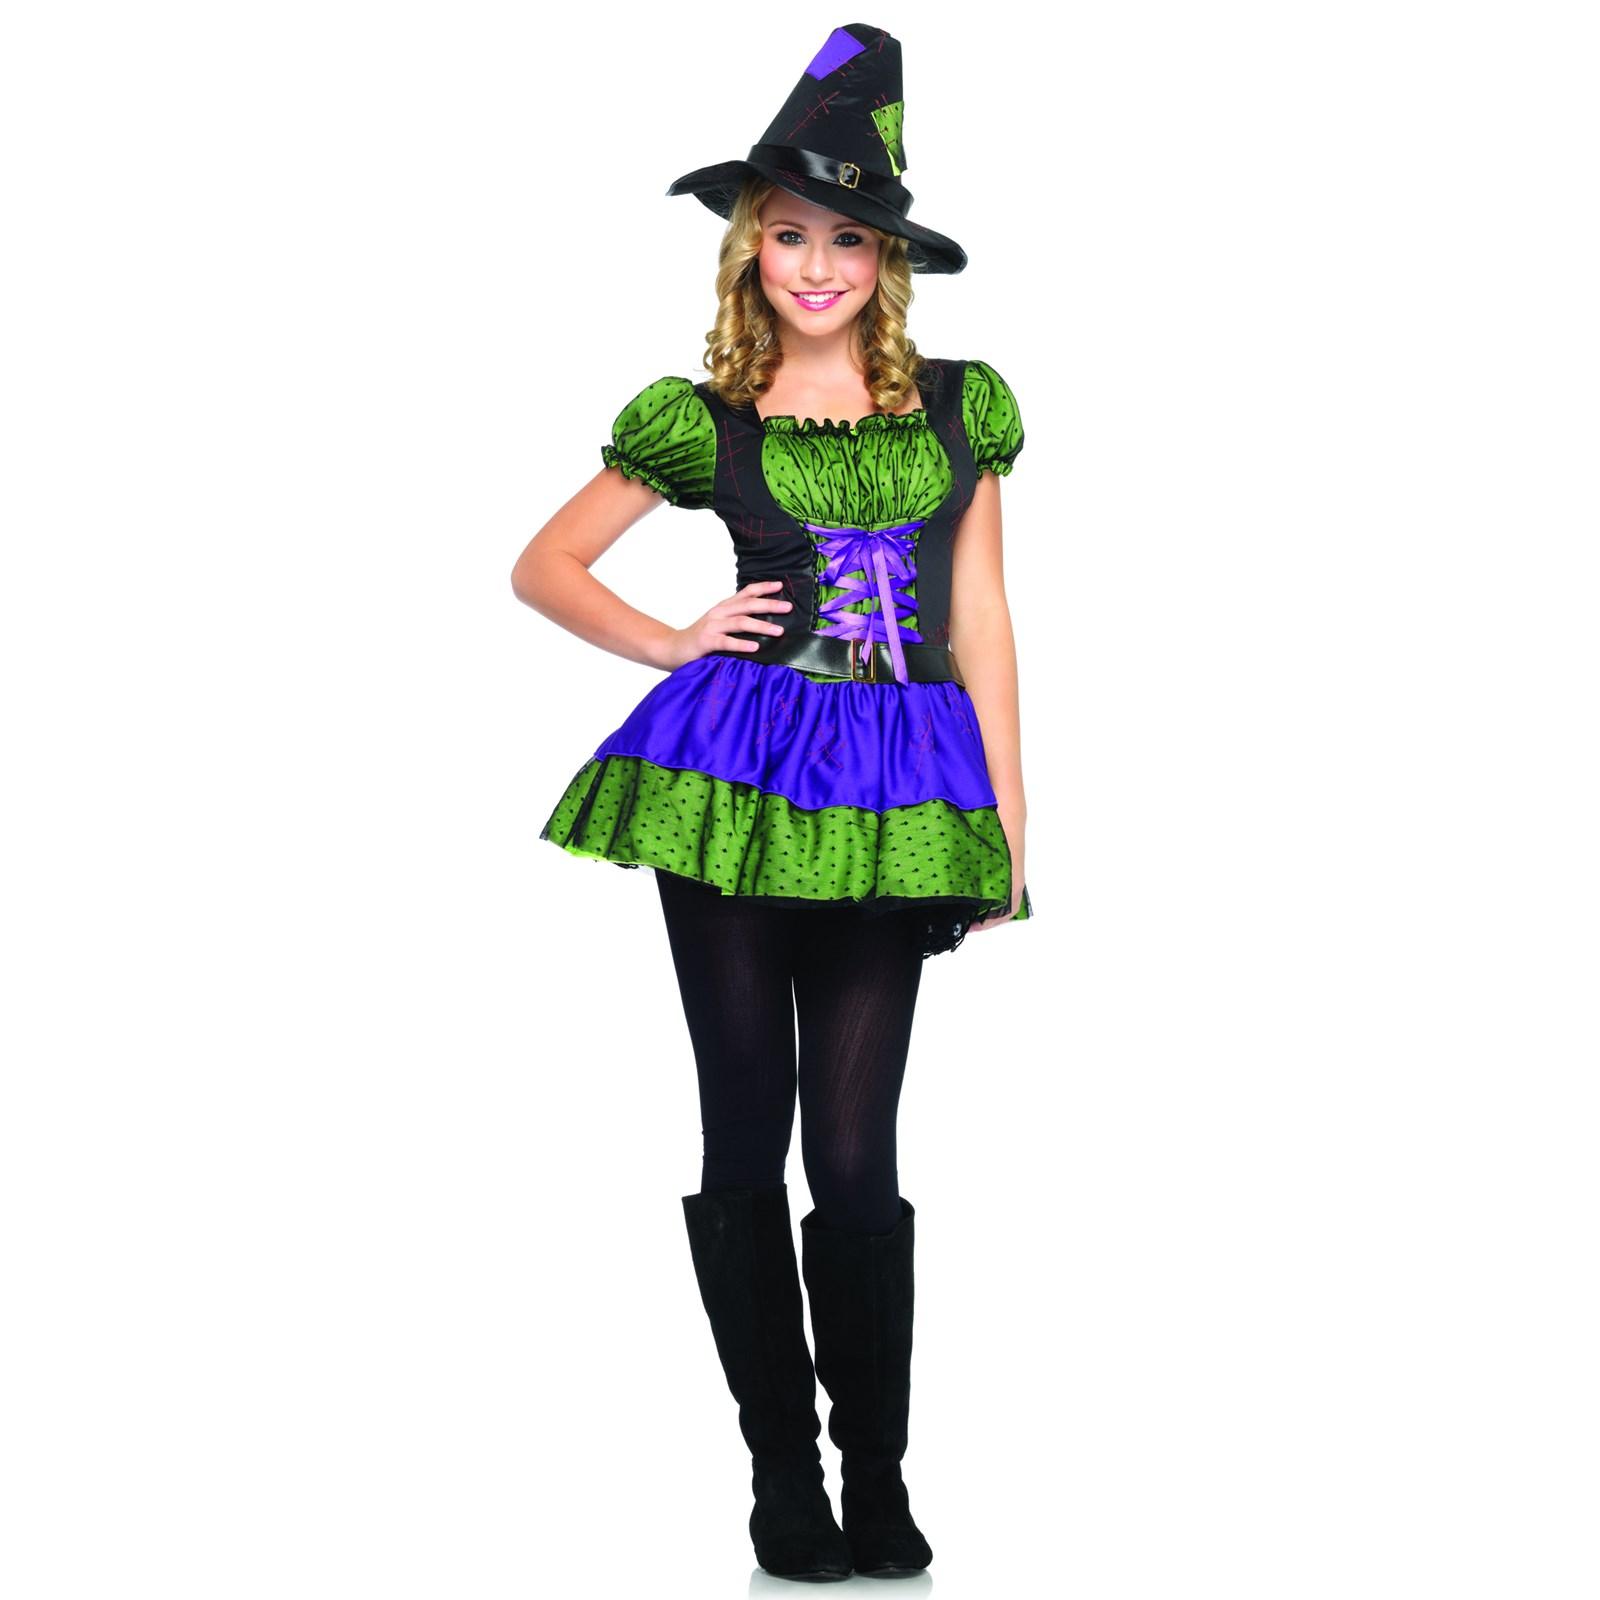 Hocus Pocus Witch Teen Costume | BuyCostumes.com